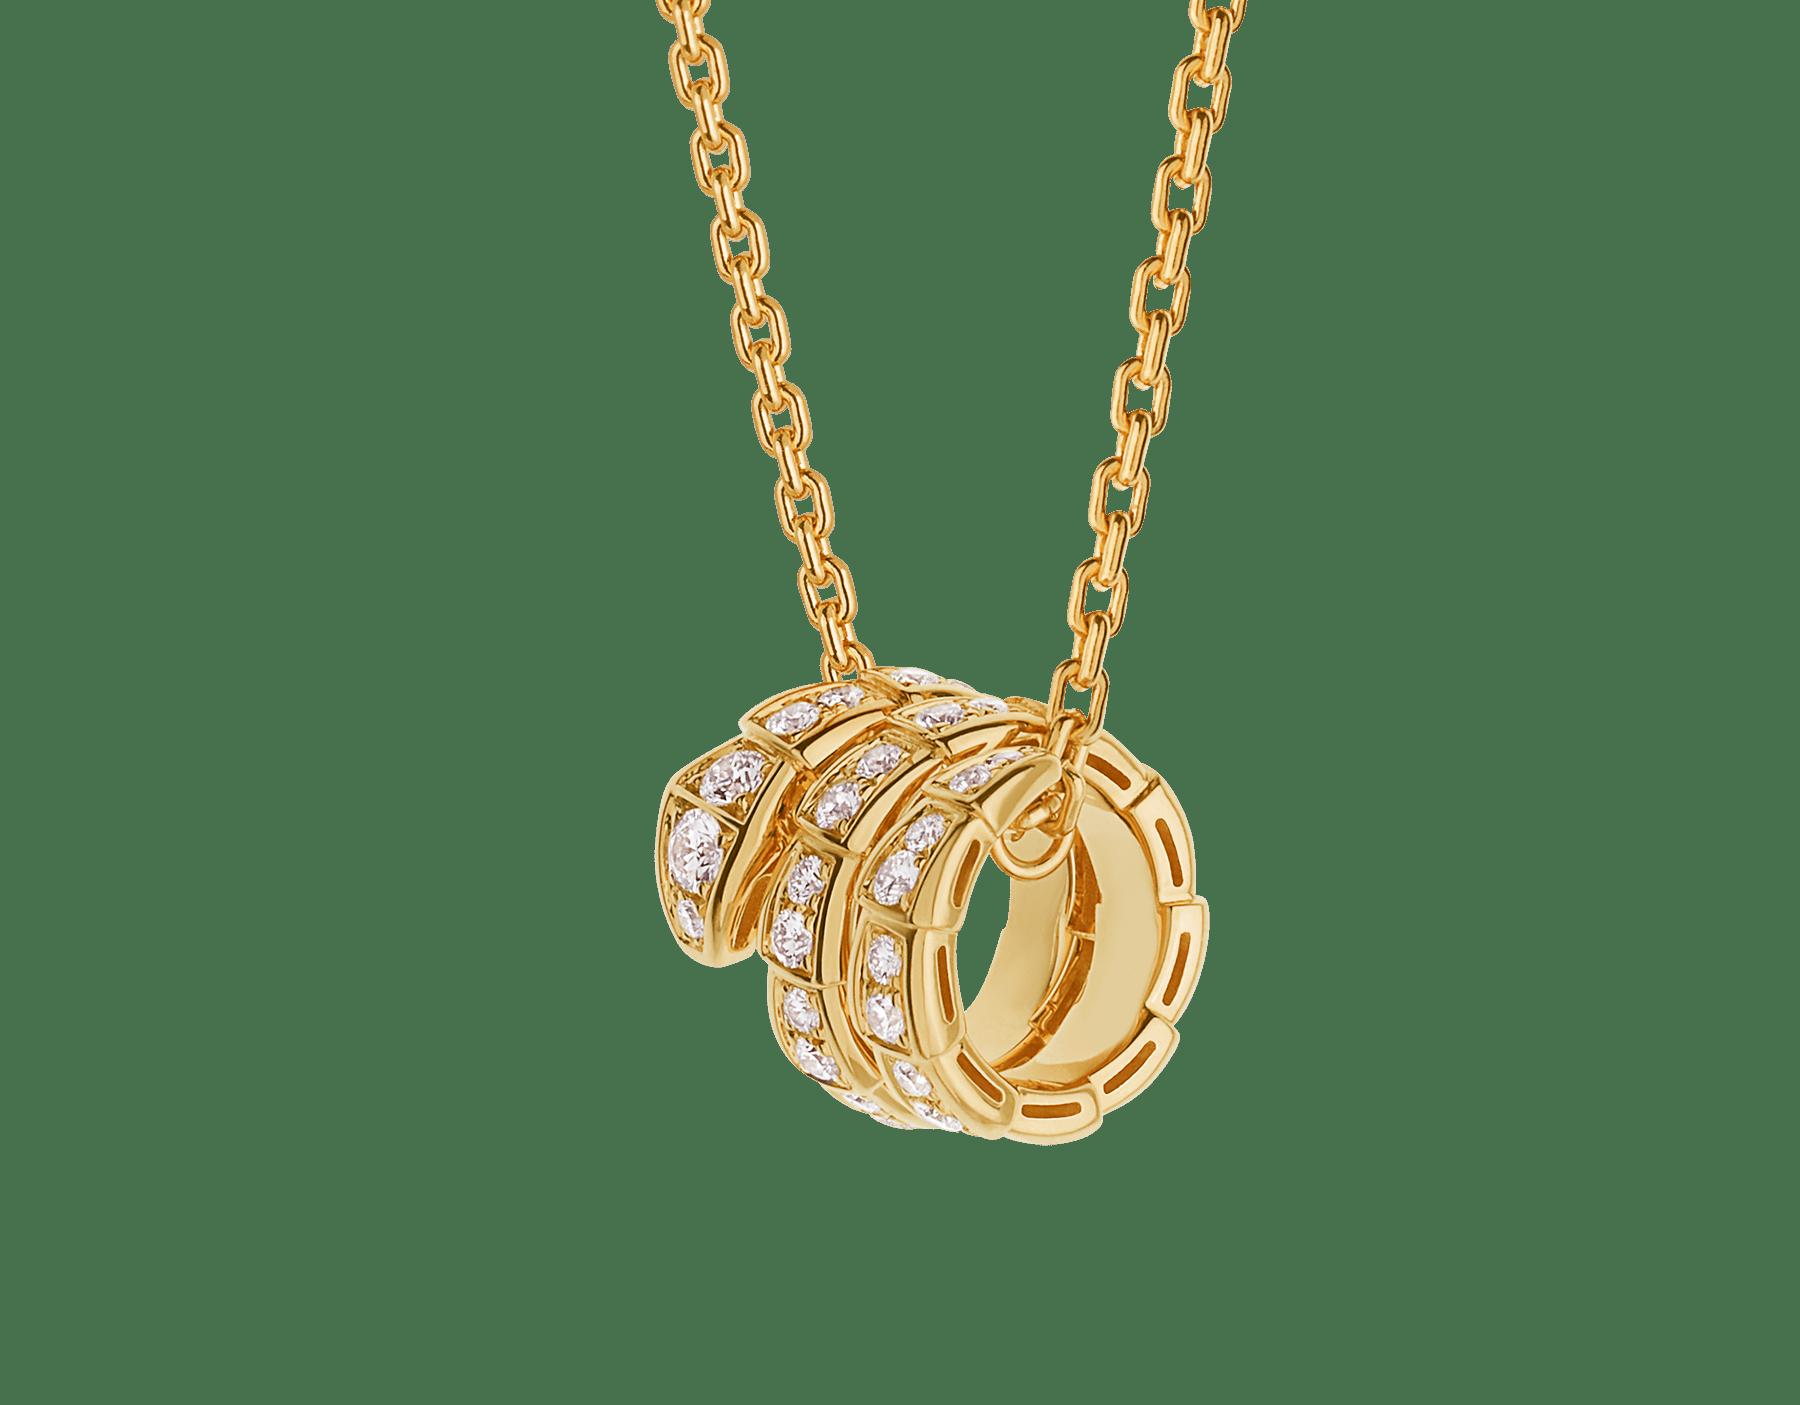 Serpenti Viper 18 kt yellow gold pendant necklace set with pavé diamonds 357936 image 1